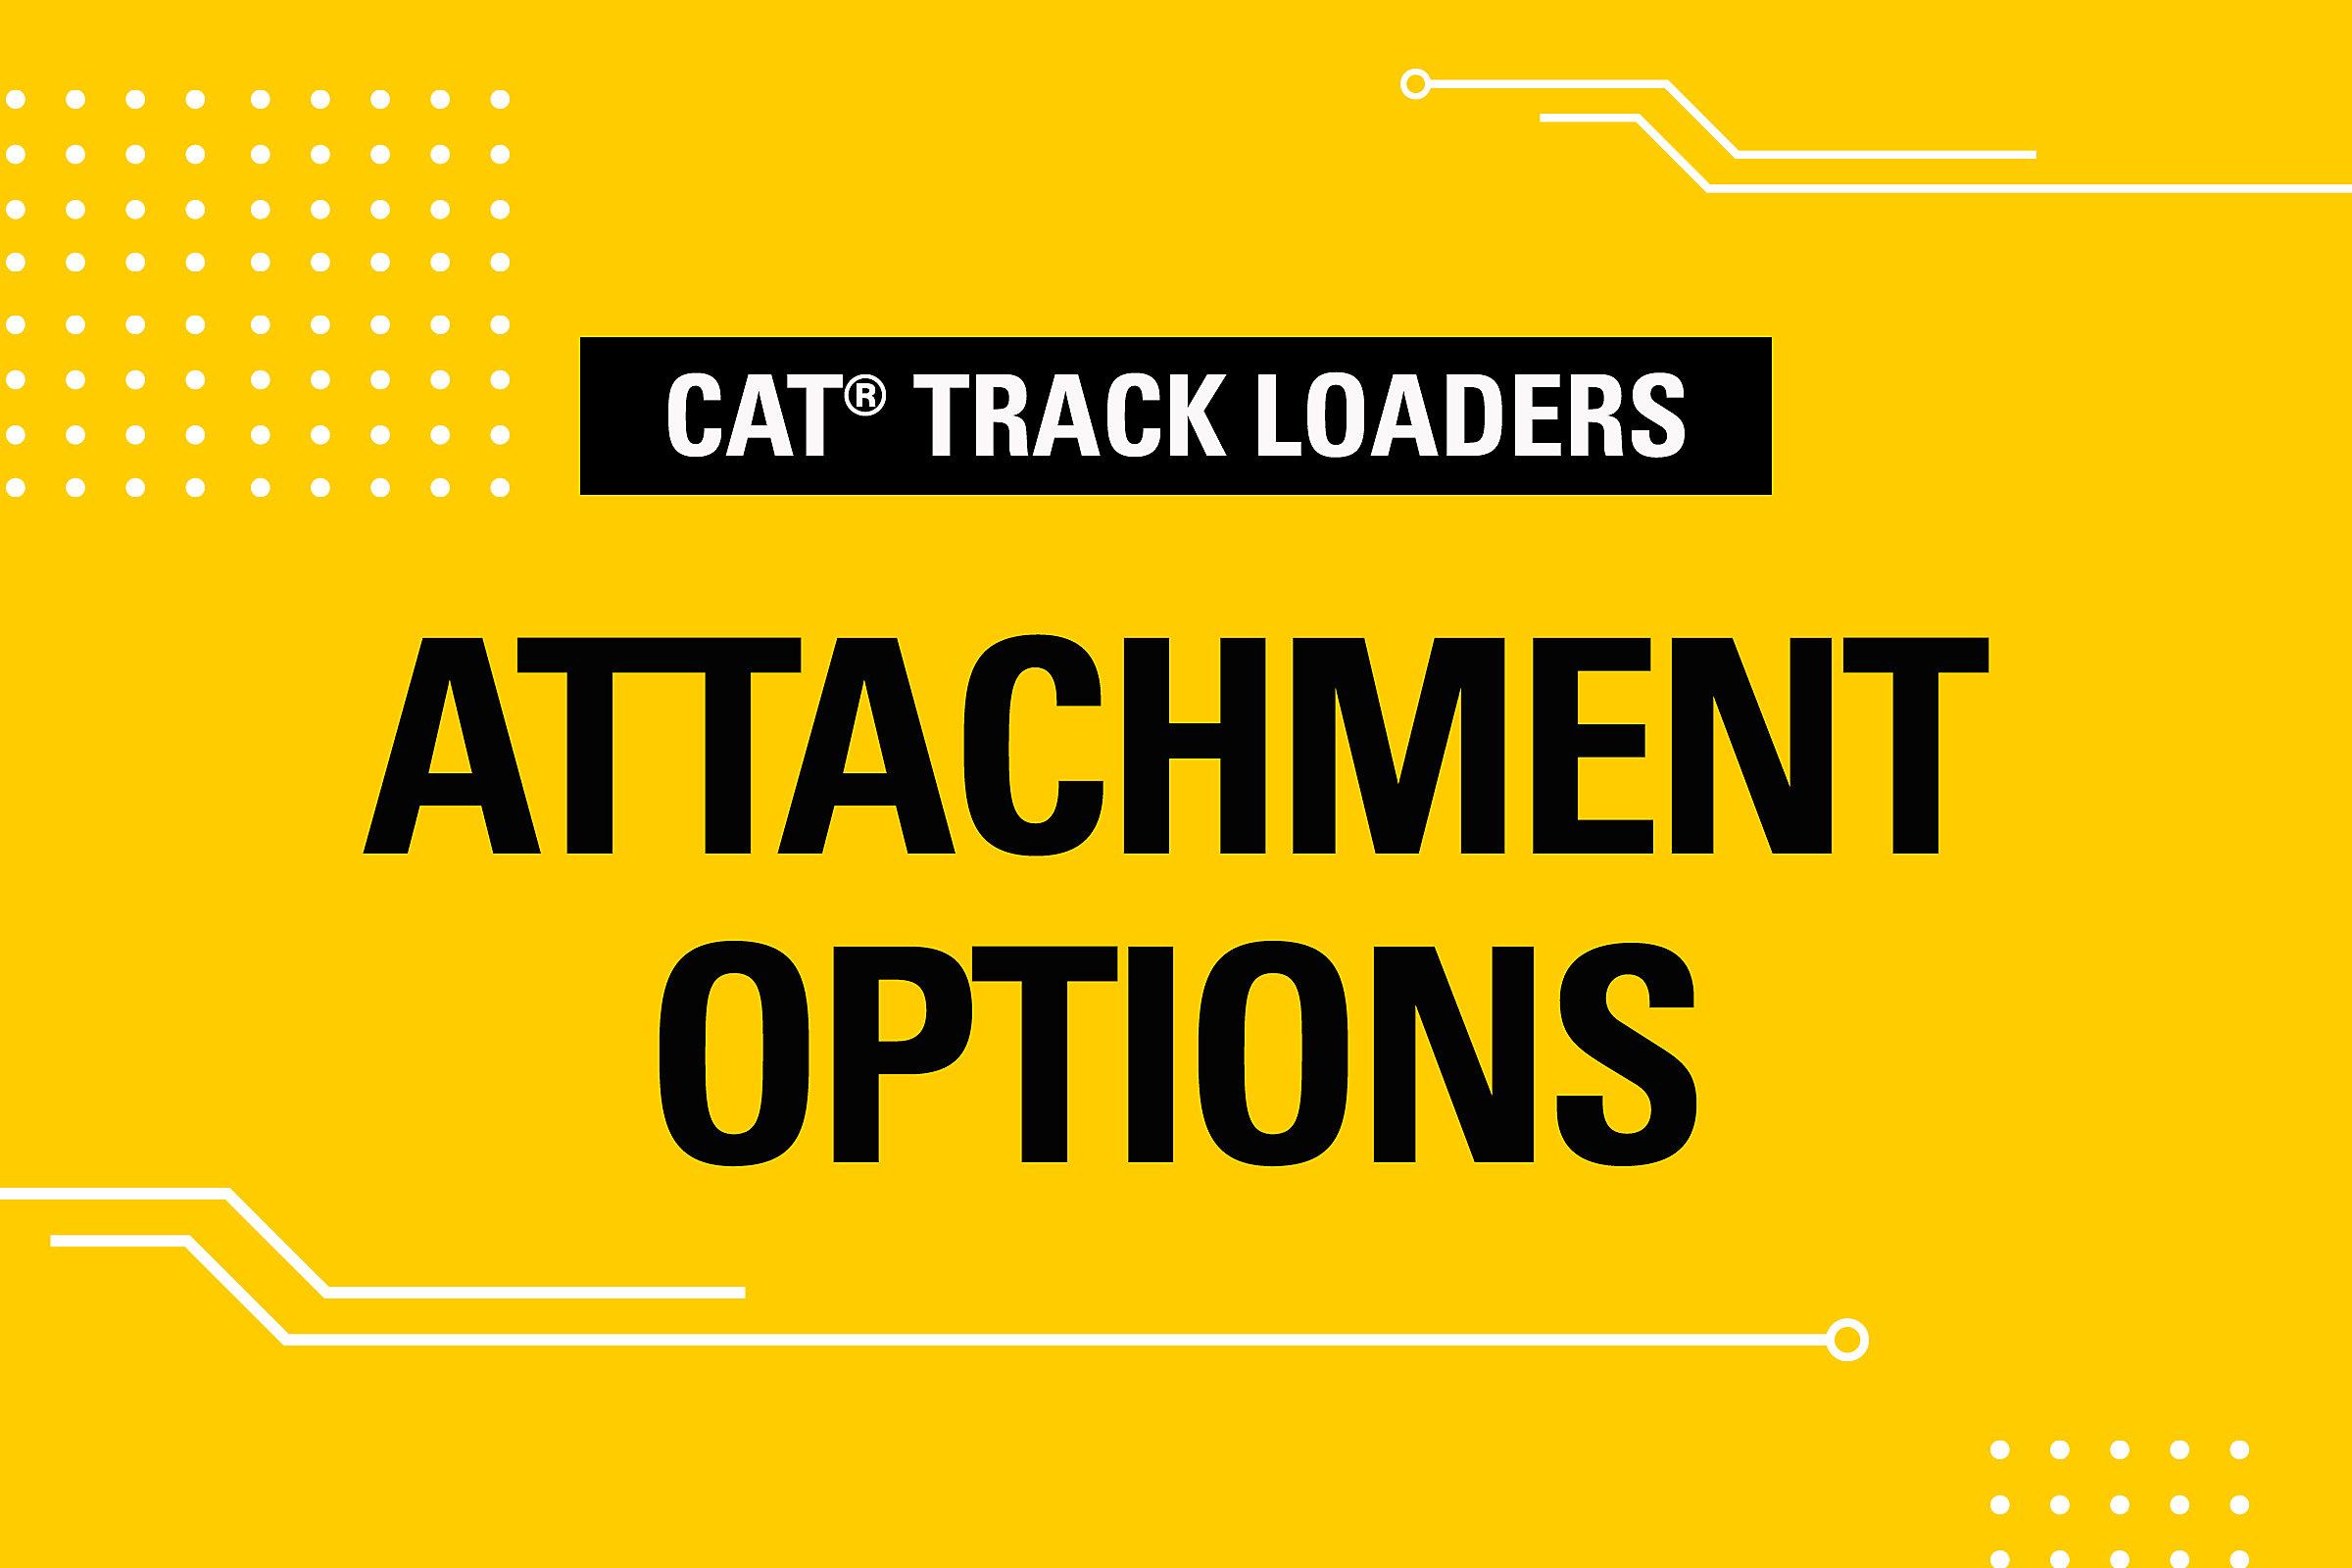 Attachment Options